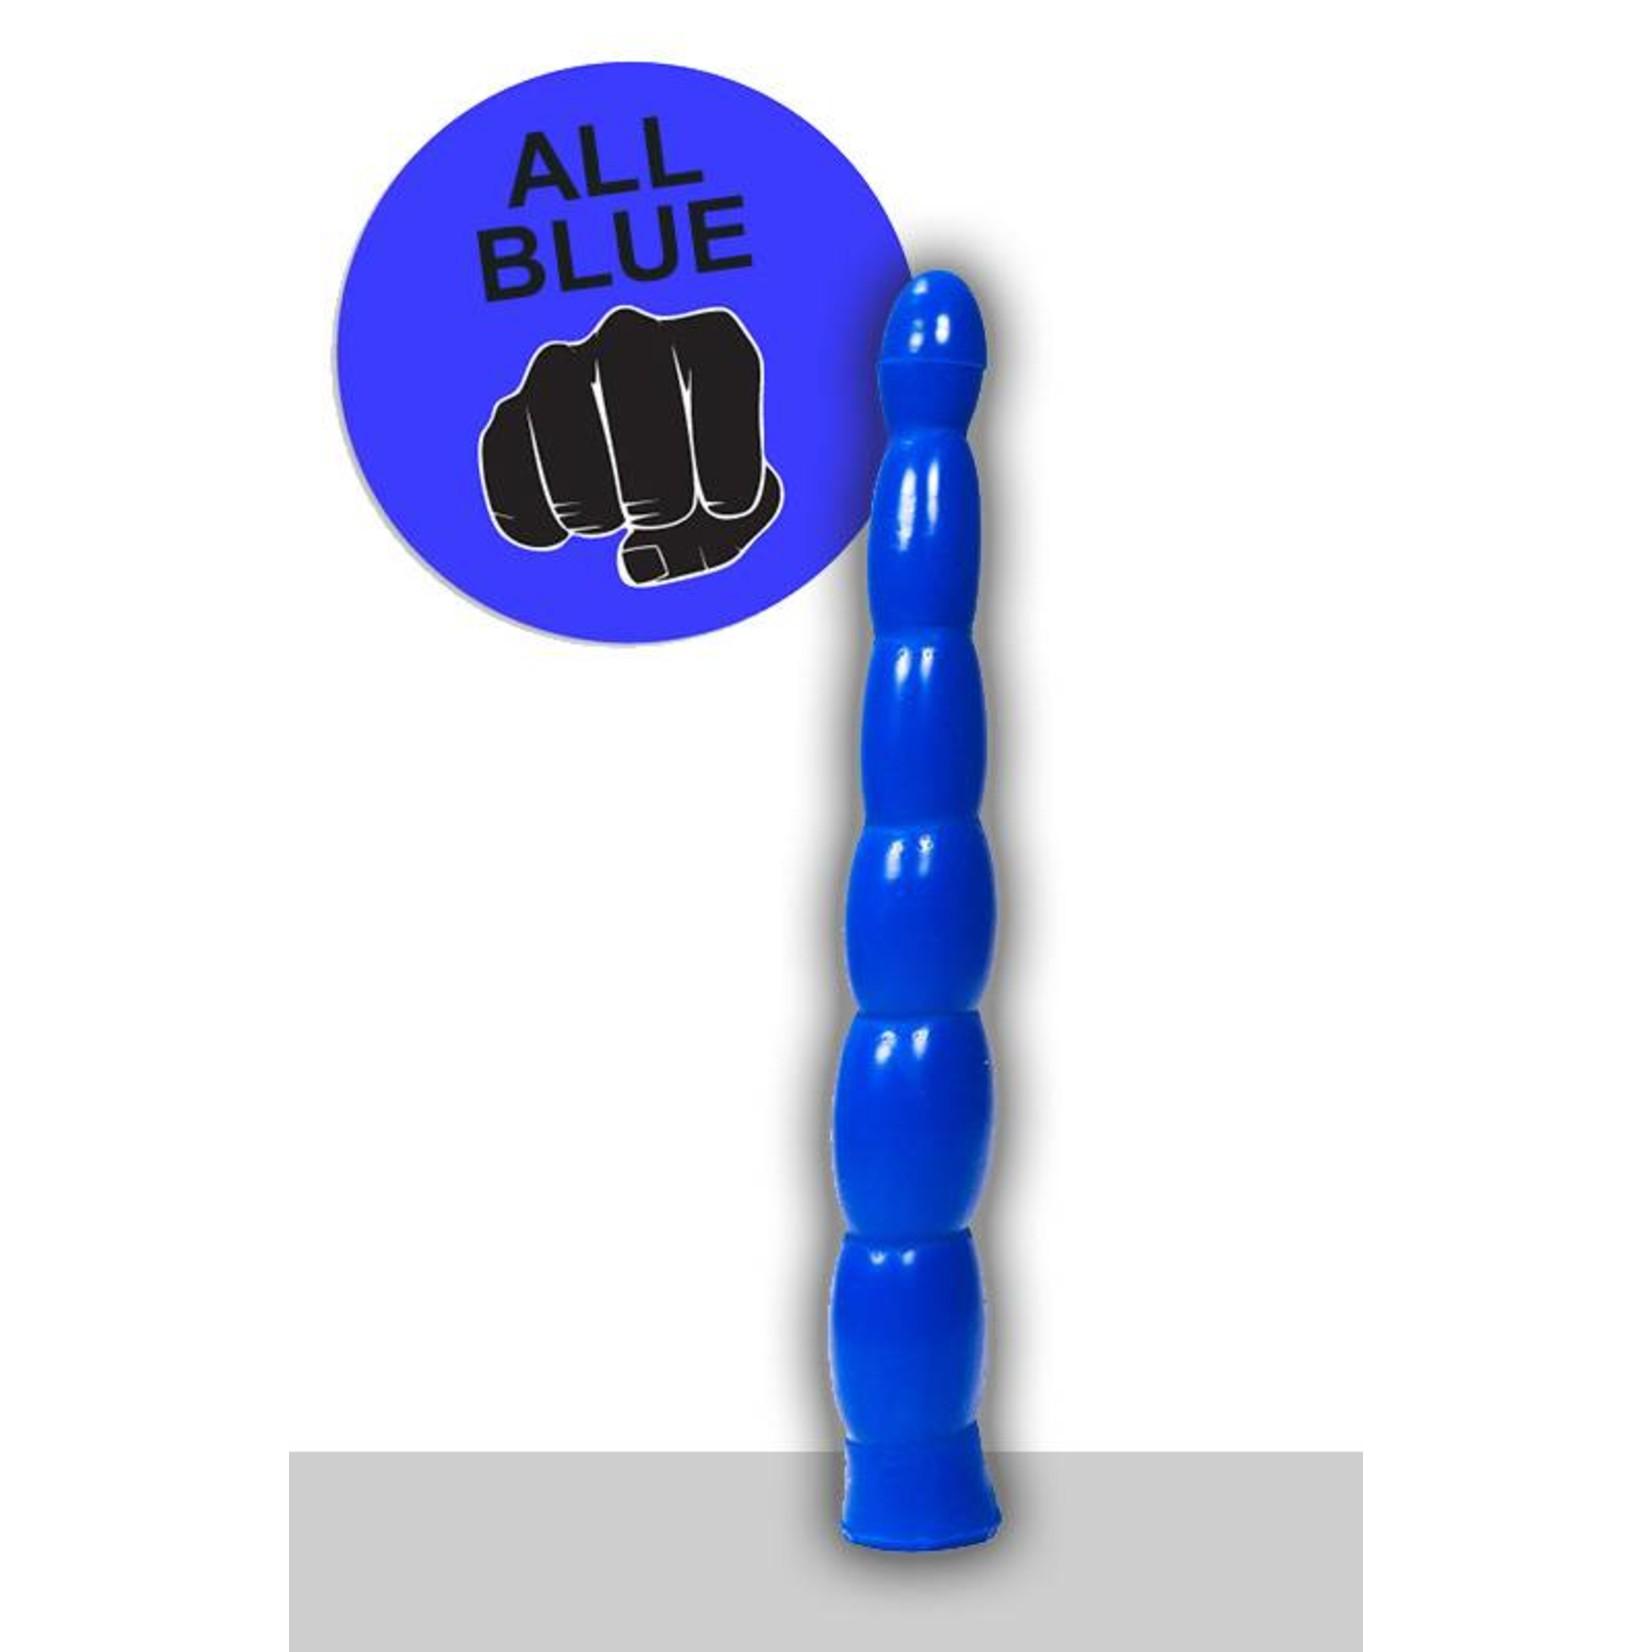 All Black All Blue Dildo - ABB 16